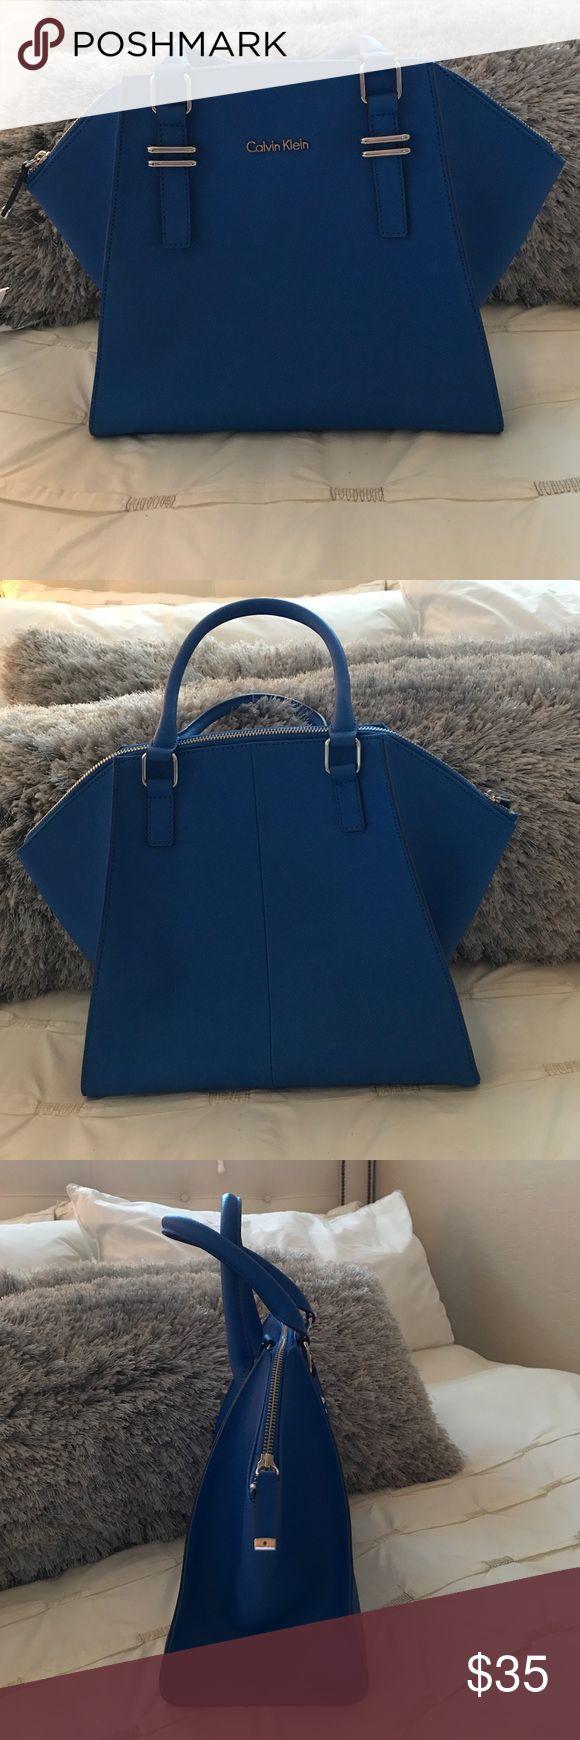 Best 25 Calvin Klein Handbags Ideas On Pinterest White